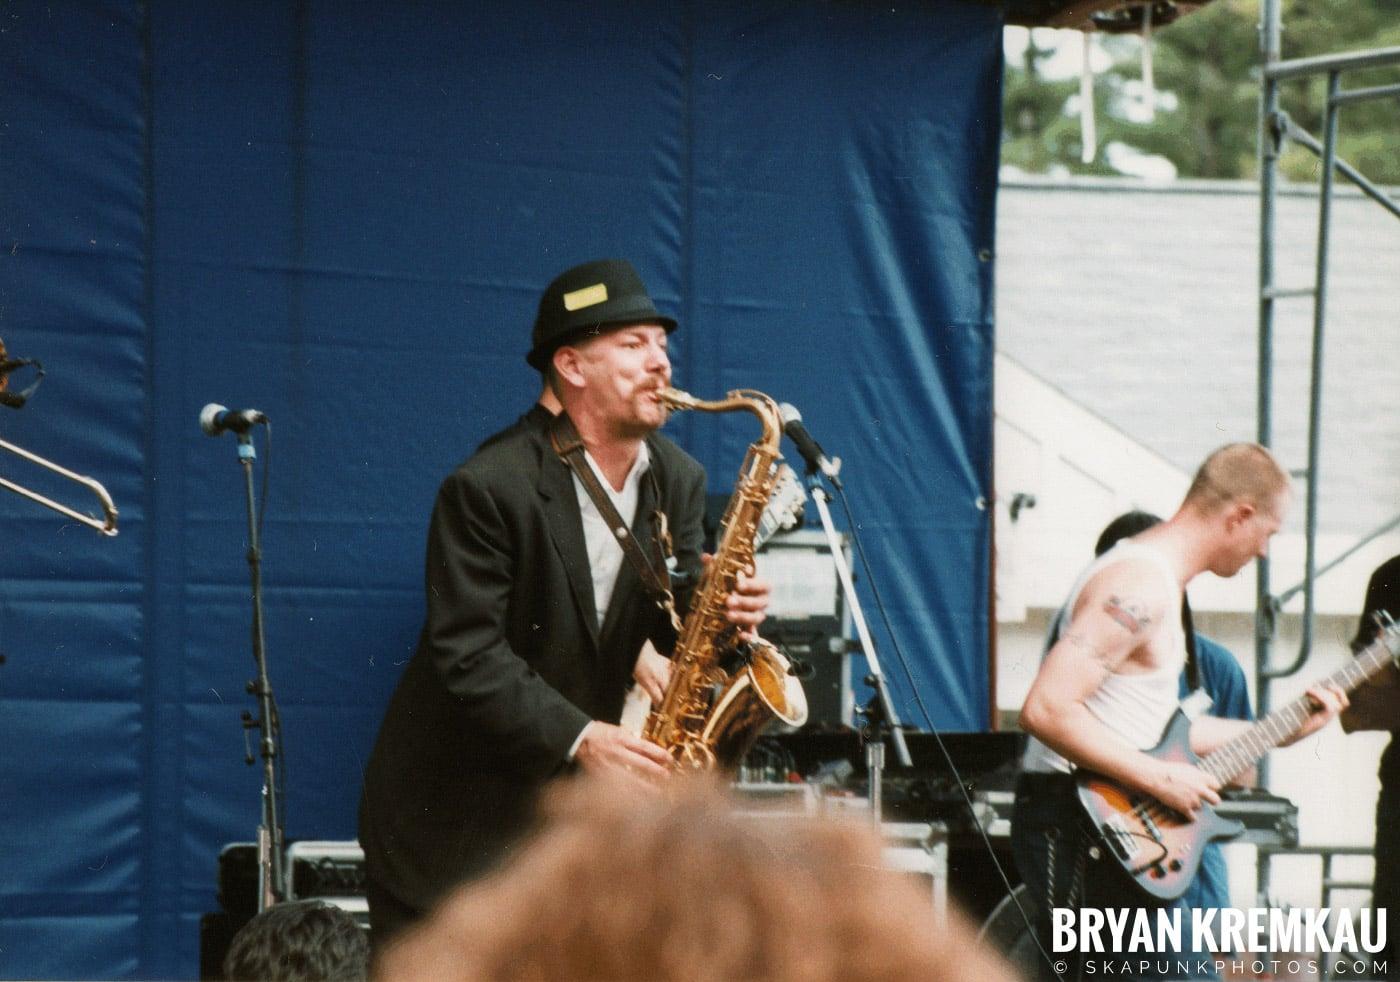 The Skoidats @ New England Ska Fest 98, Westford, MA - 8.22.98 (2)